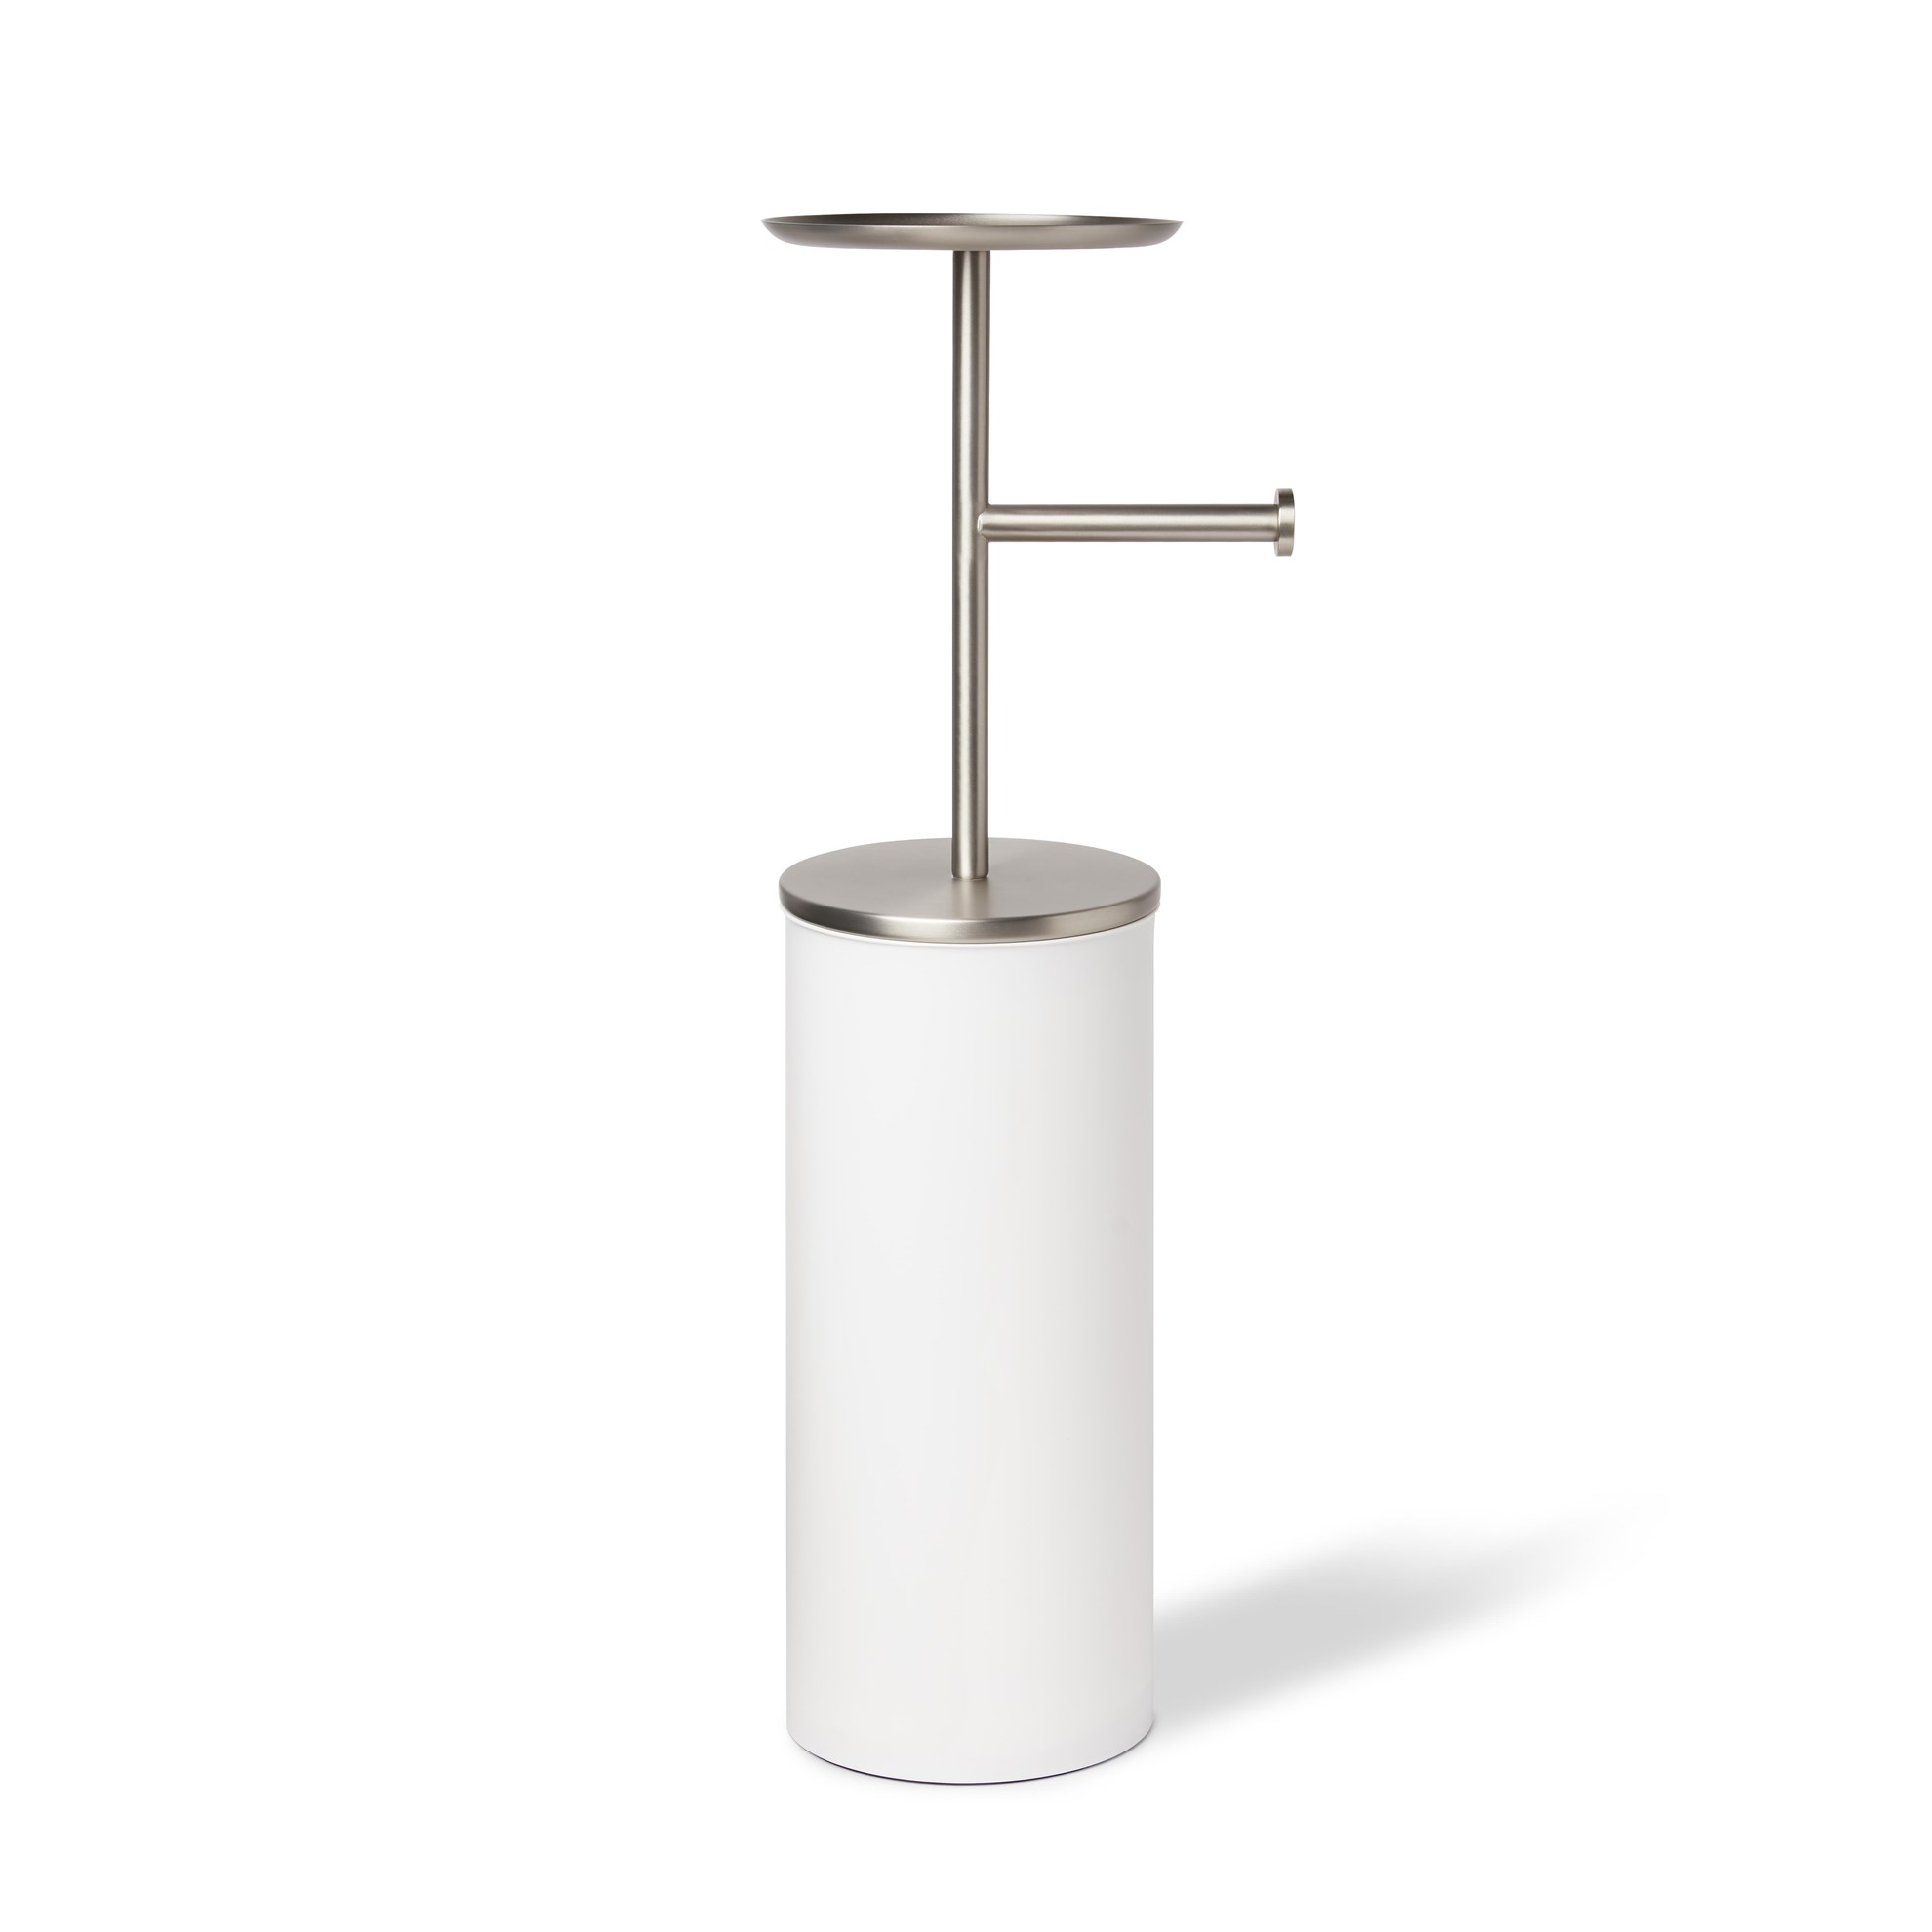 Držák na toaletní papír PORTALOO - bílá/nikl_1